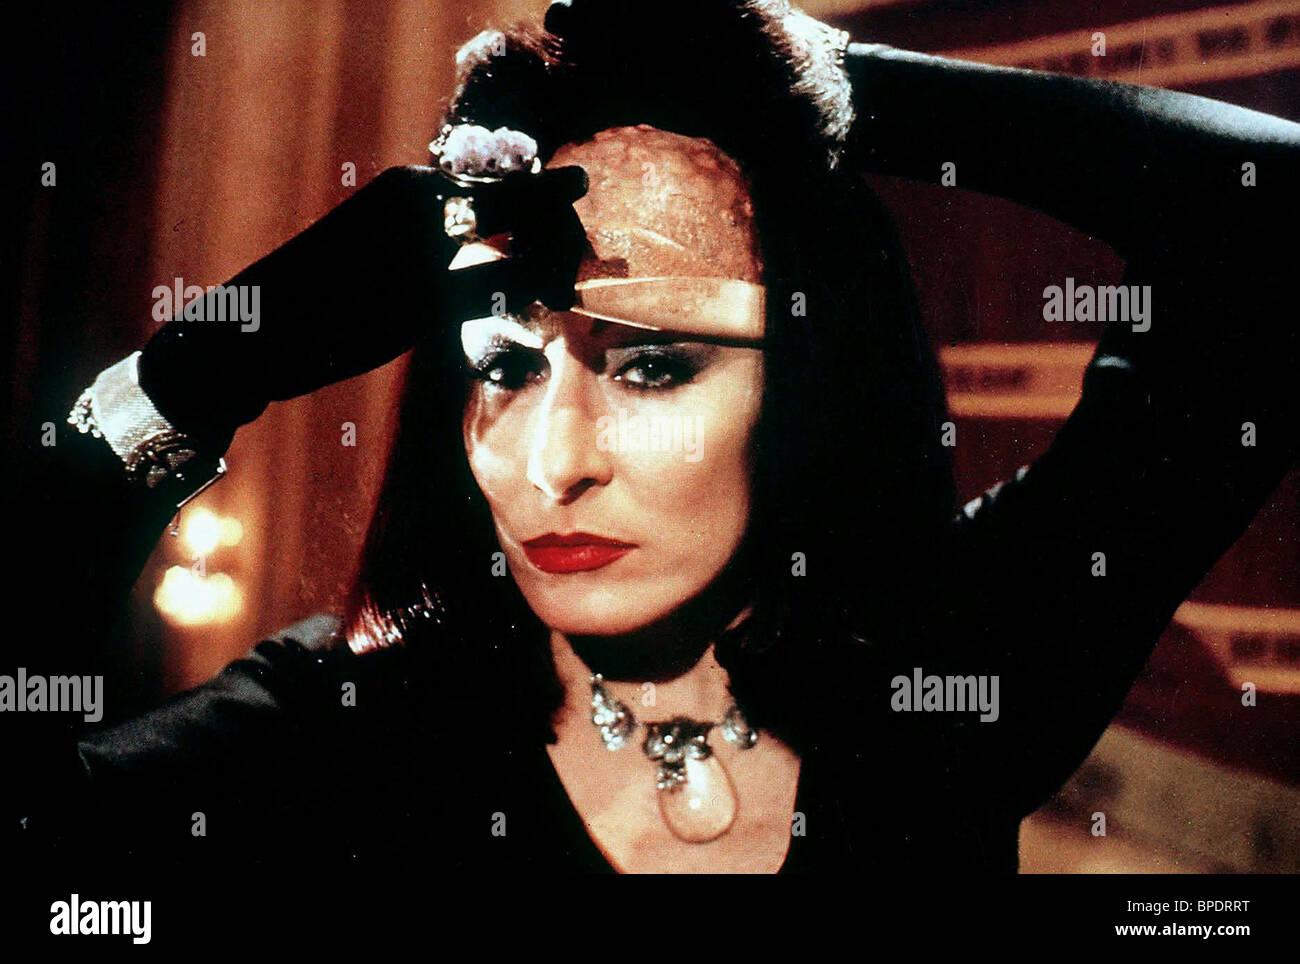 ANJELICA HUSTON THE WITCHES (1990) - Stock Image